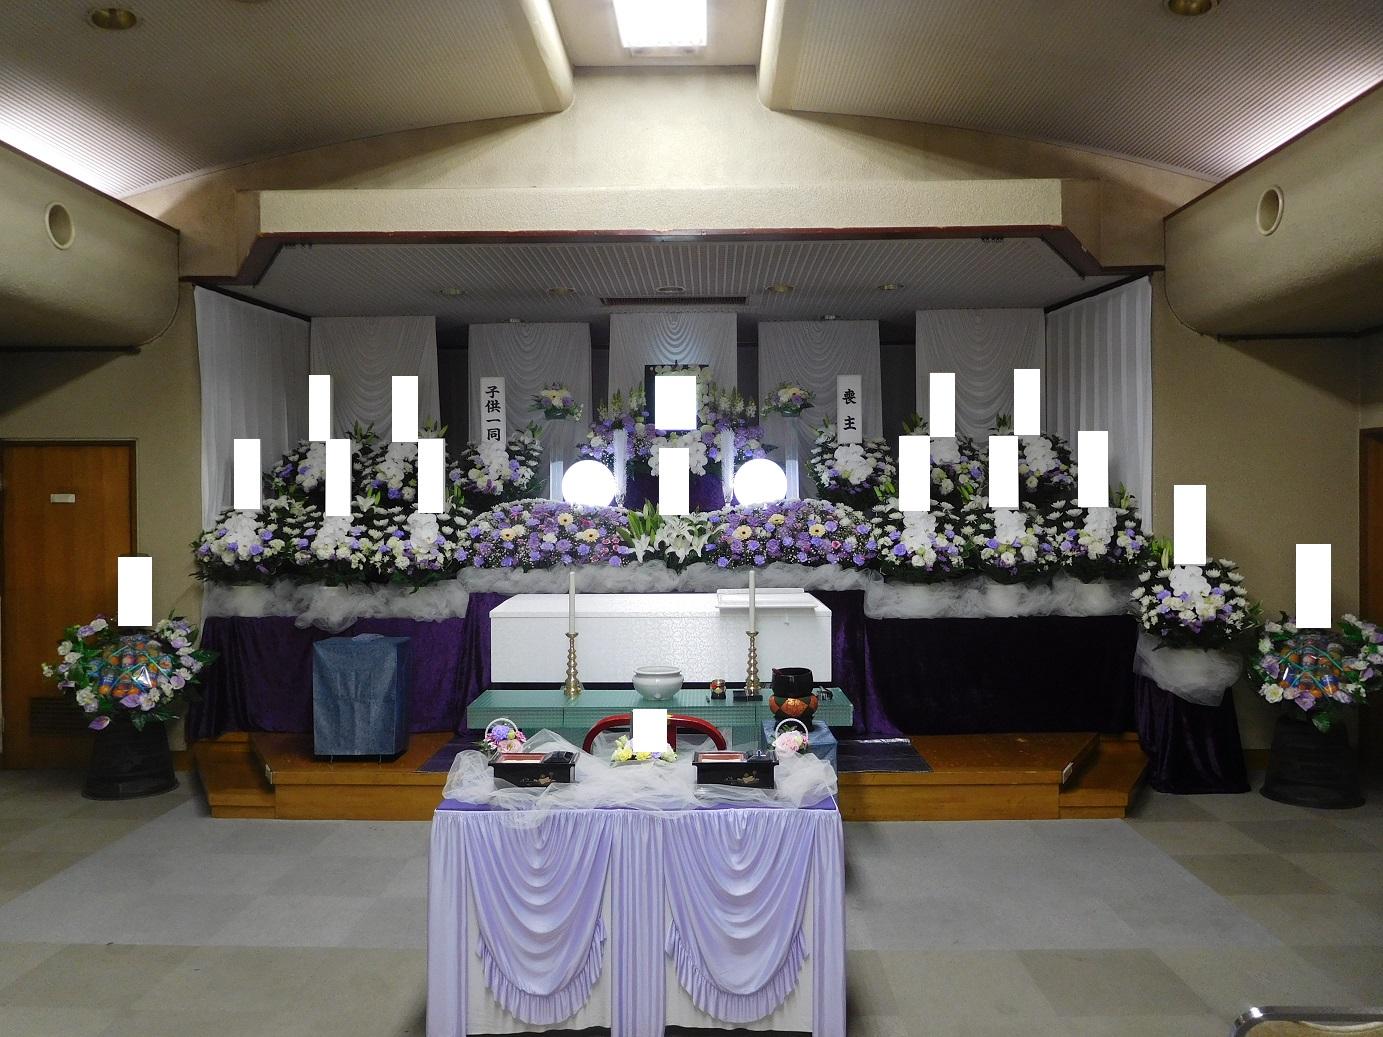 板橋区舟渡斎場での一日葬